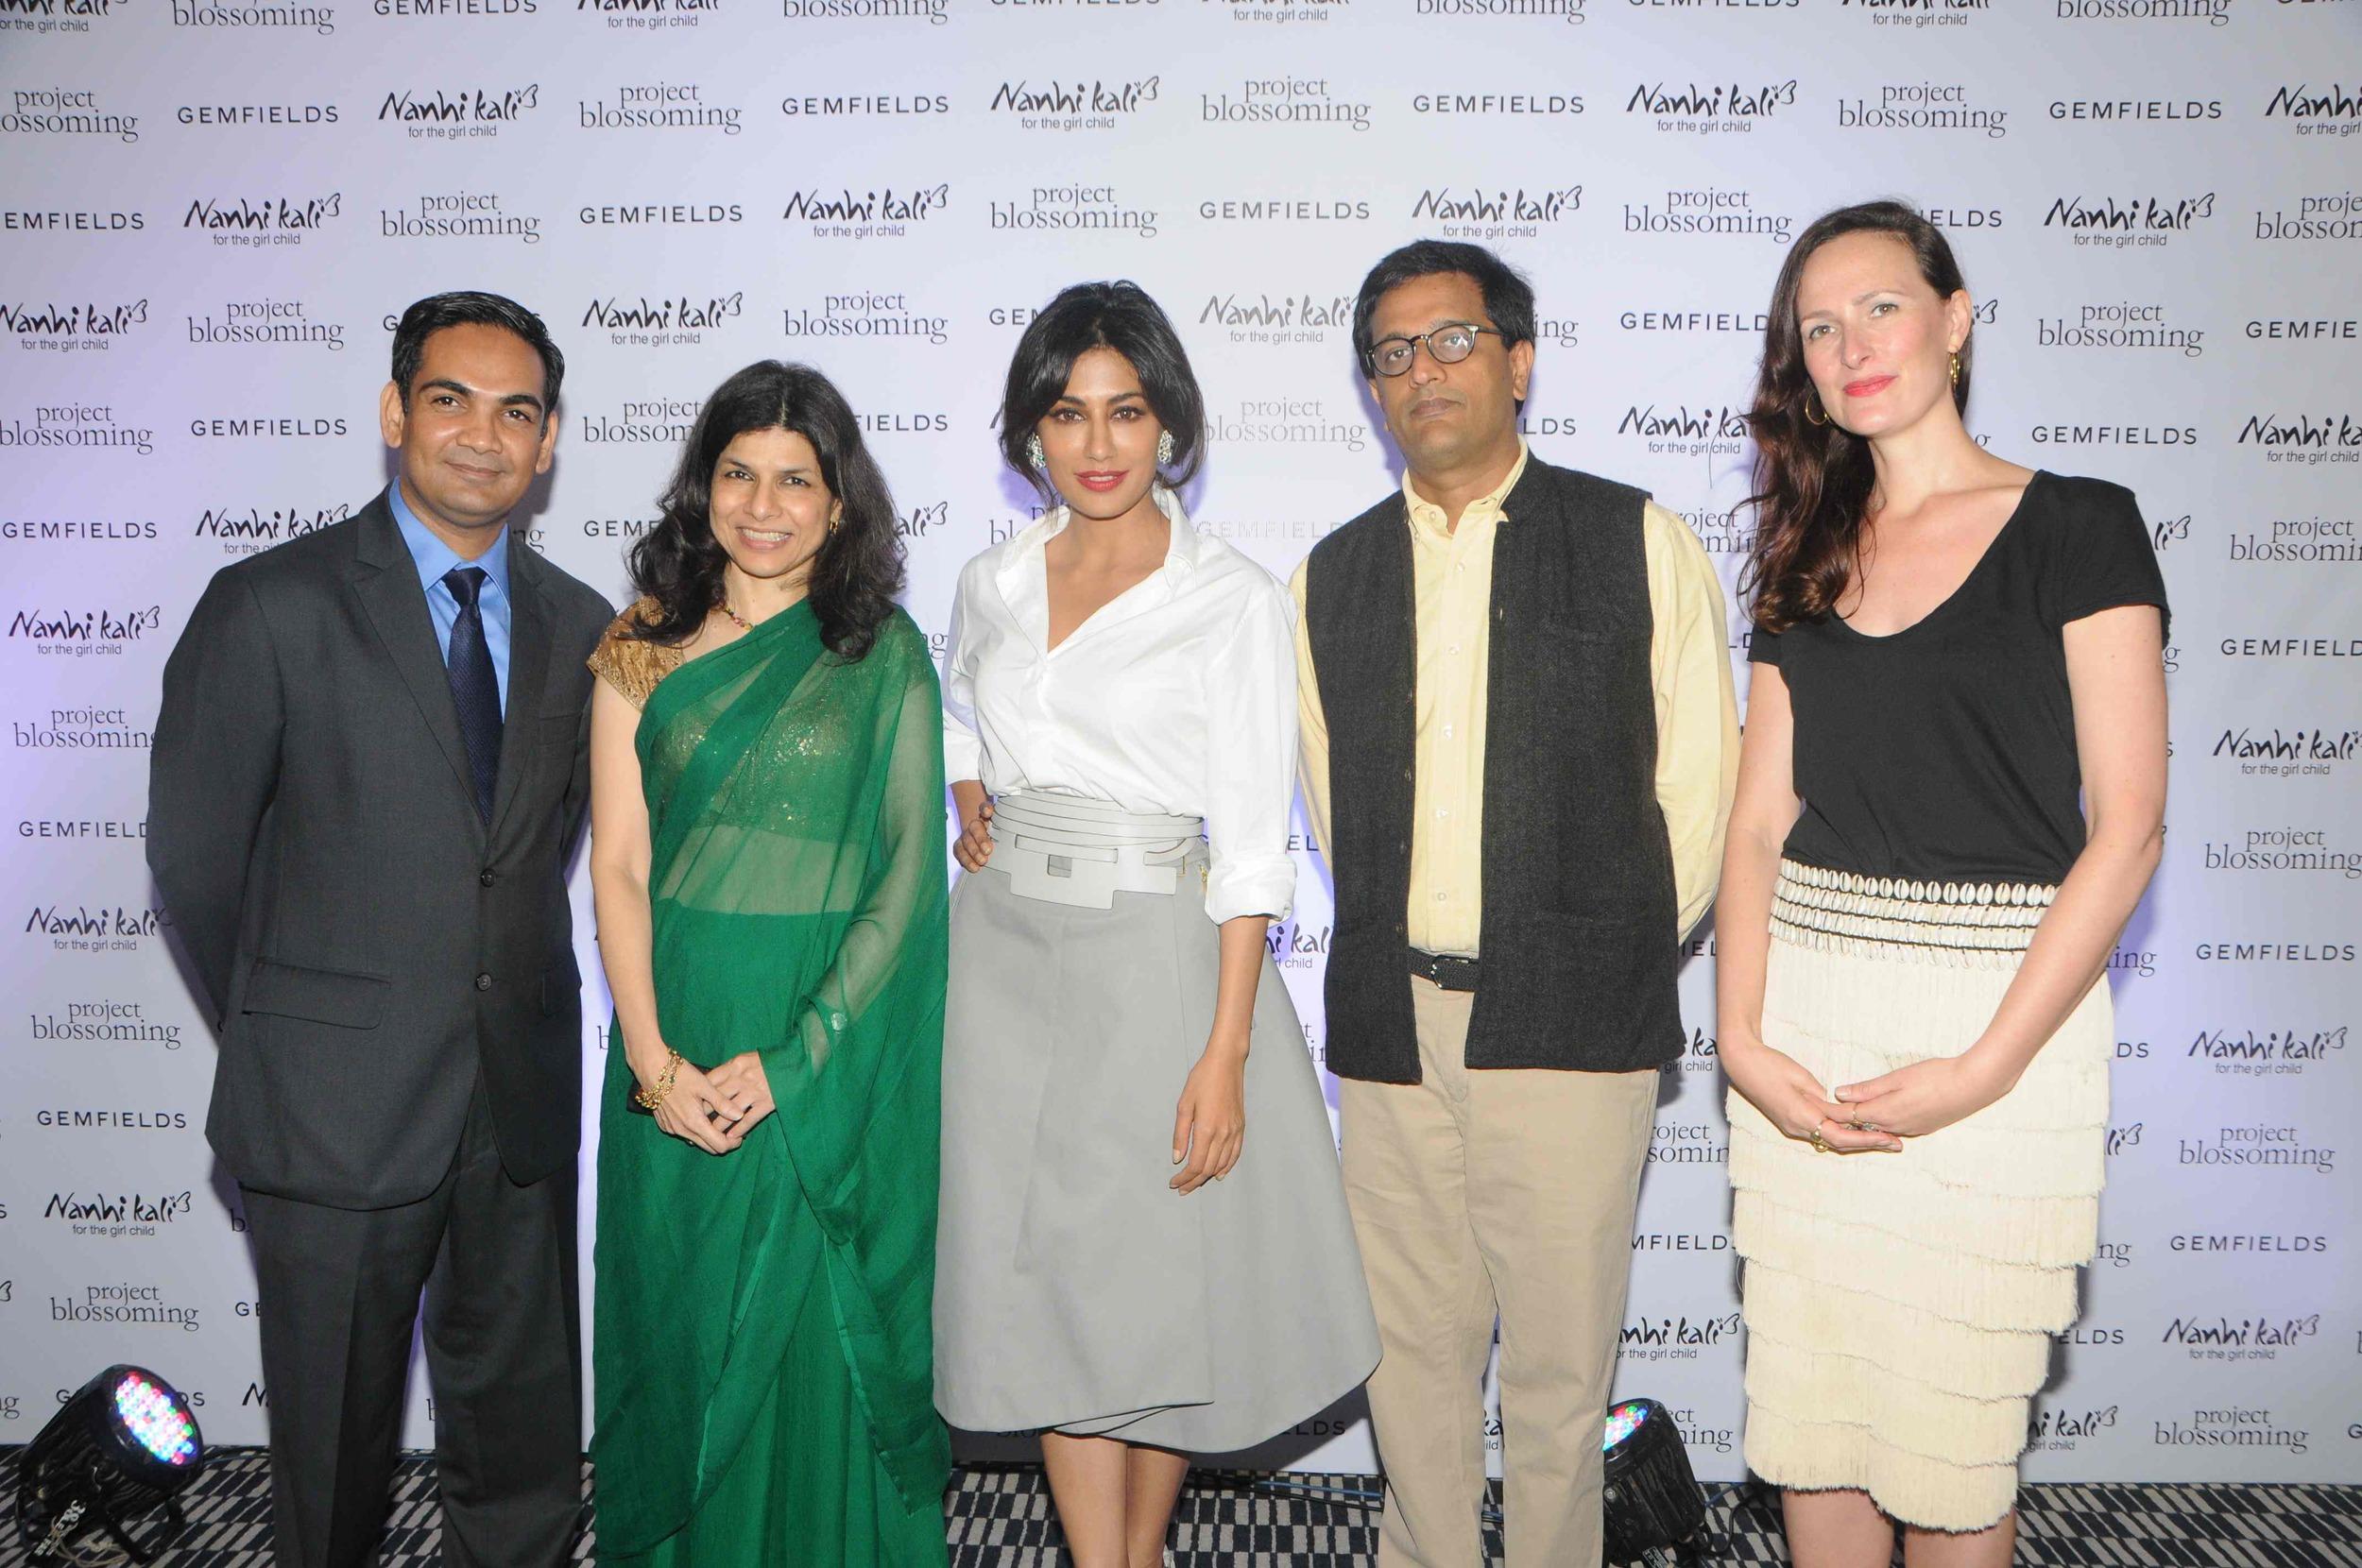 Rupak Sen, Gemfields, Sheetal Mehta, KCMET, Chitrangda Singh Project Blossoming Ambassador, Manoj Kumar, Naandi and Anna Haber